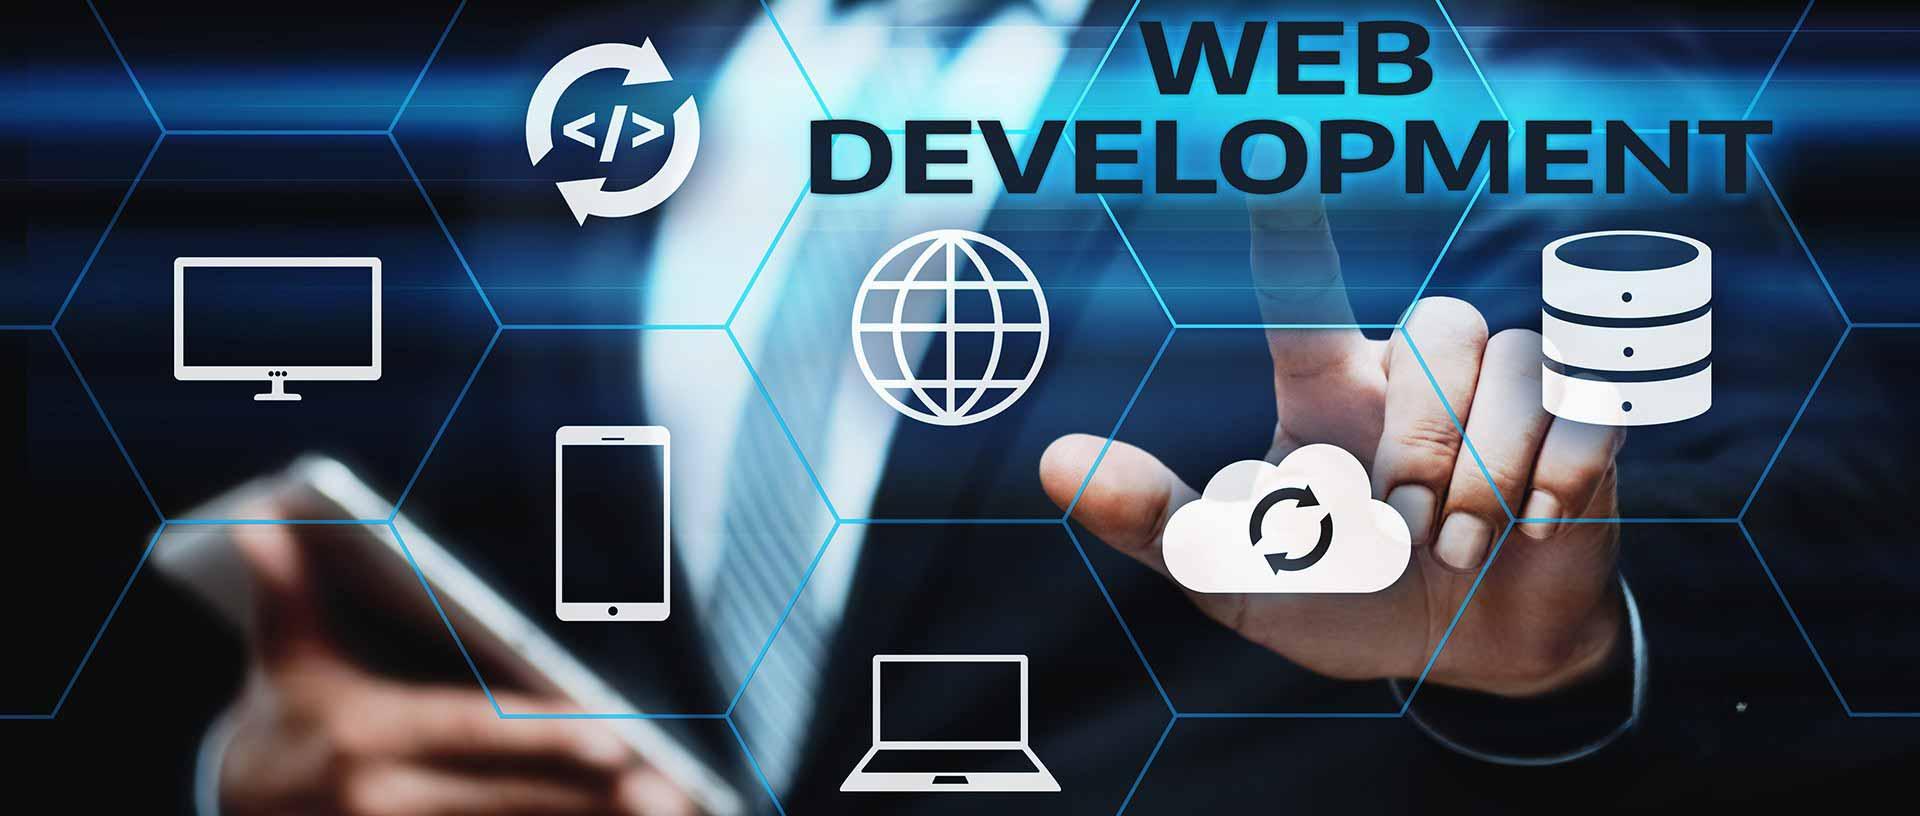 Web Development by TechSquad